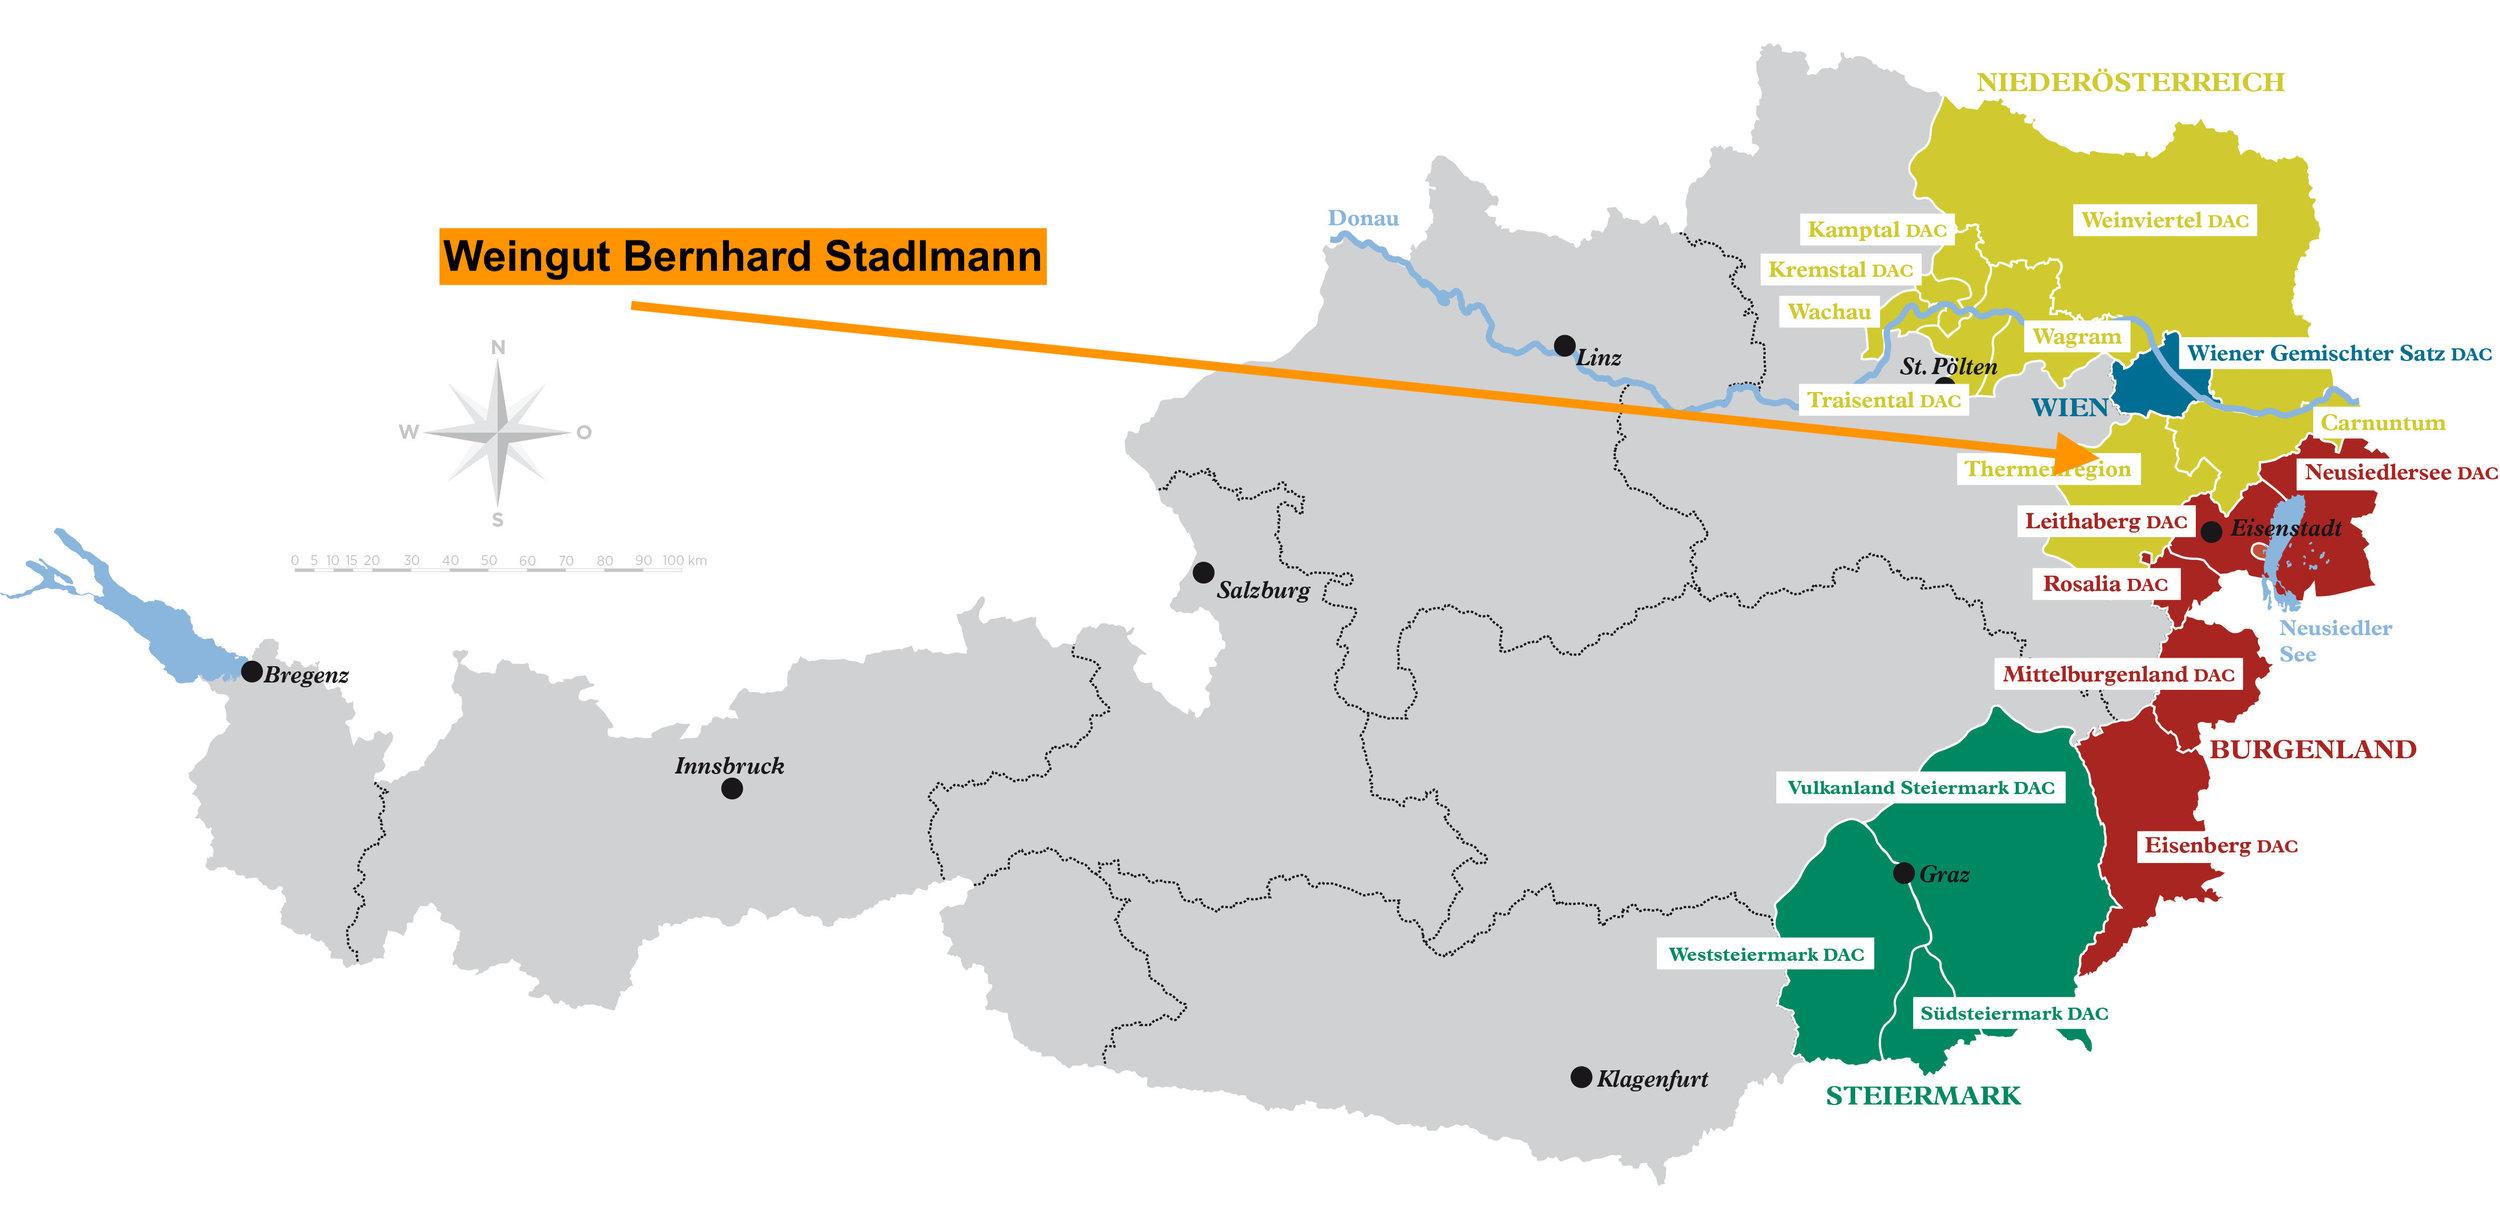 Weinbaugebiete_Karte_DE_ohneBergld_Mai18.jpg